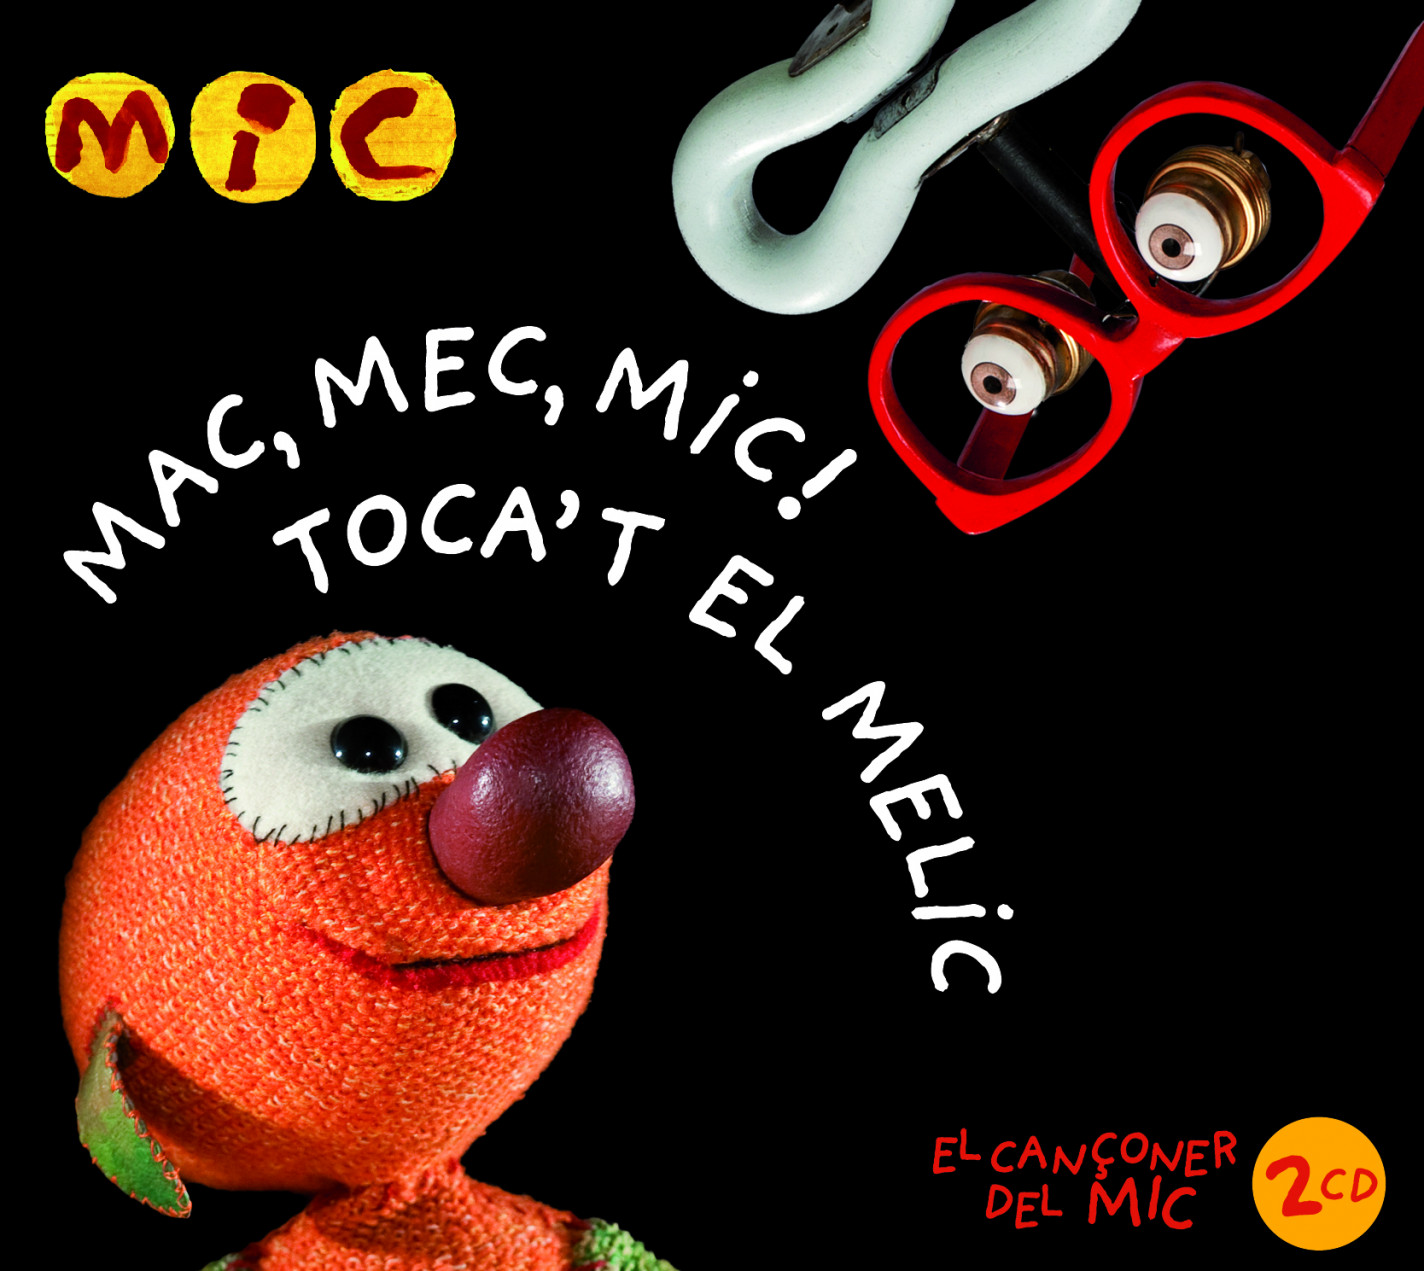 Enumerar físicamente moco  SUPER3 MAC MEC MIC - TOCA'T EL MELIC 2CD - Abacus Online